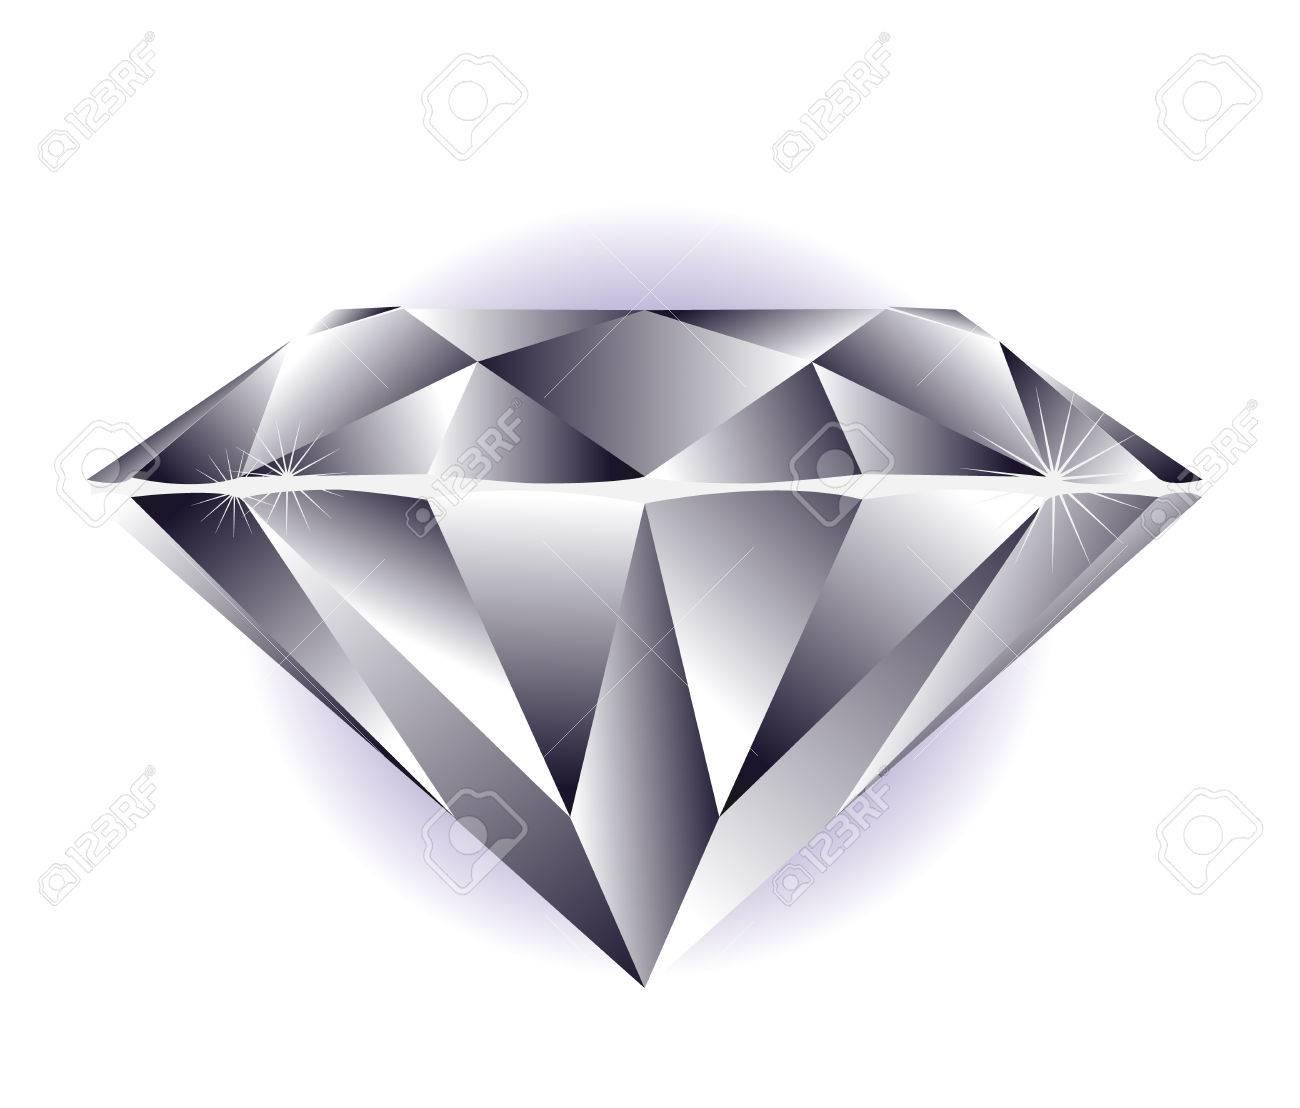 Diamond illustration on a white background. Stock Vector - 3199605